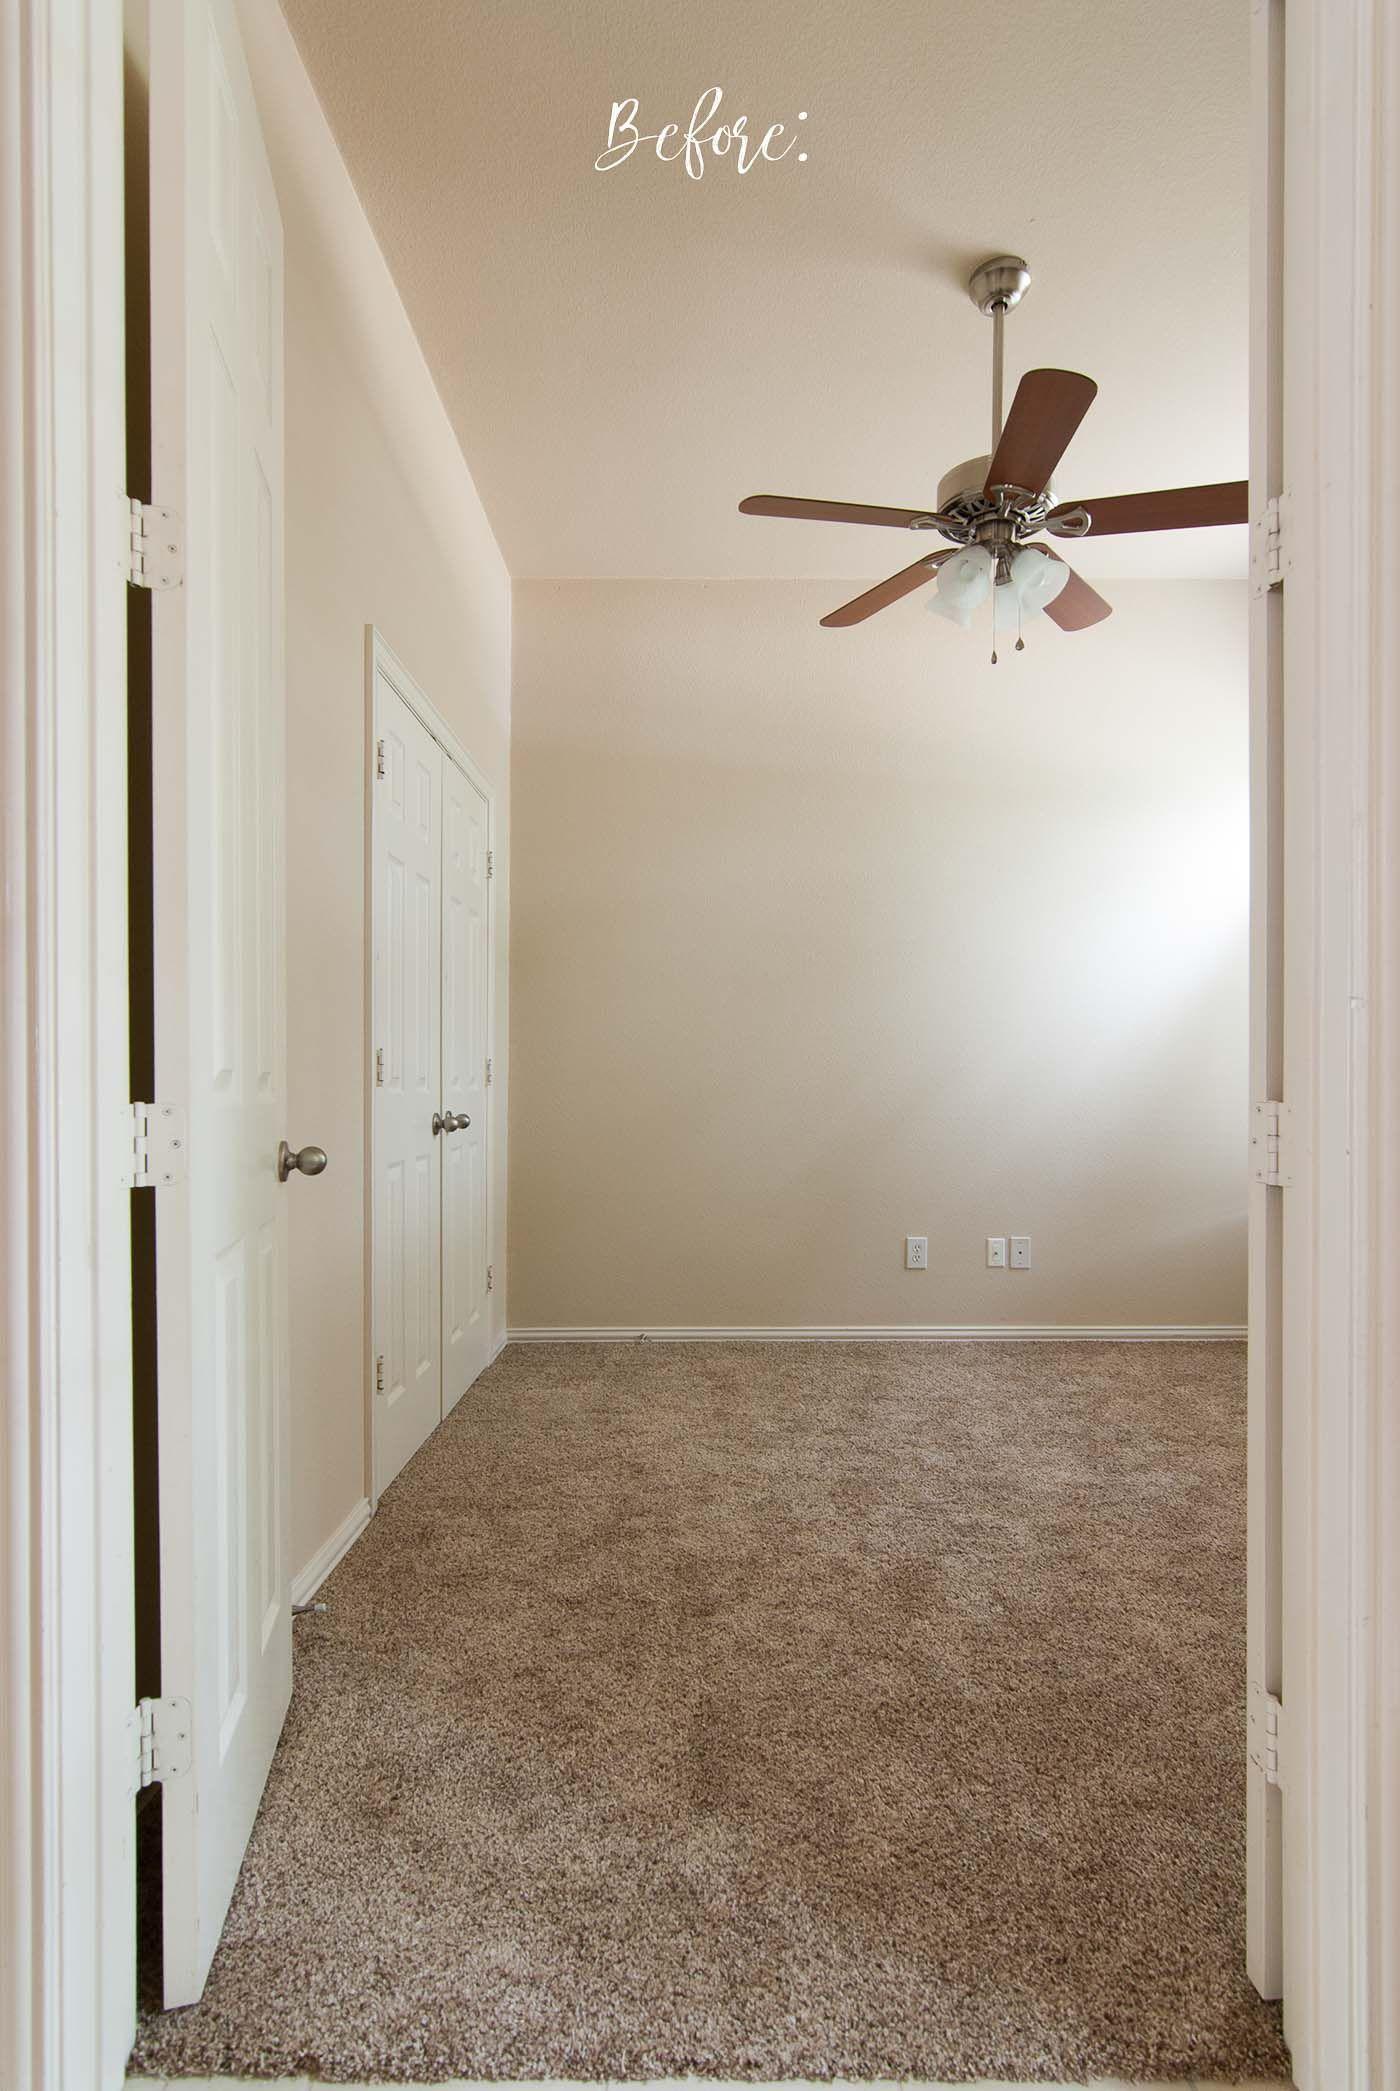 Secret Project Reveal Diy Laminate Flooring With Select Surfaces Flooring Basement Remodeling Laminate Flooring Diy